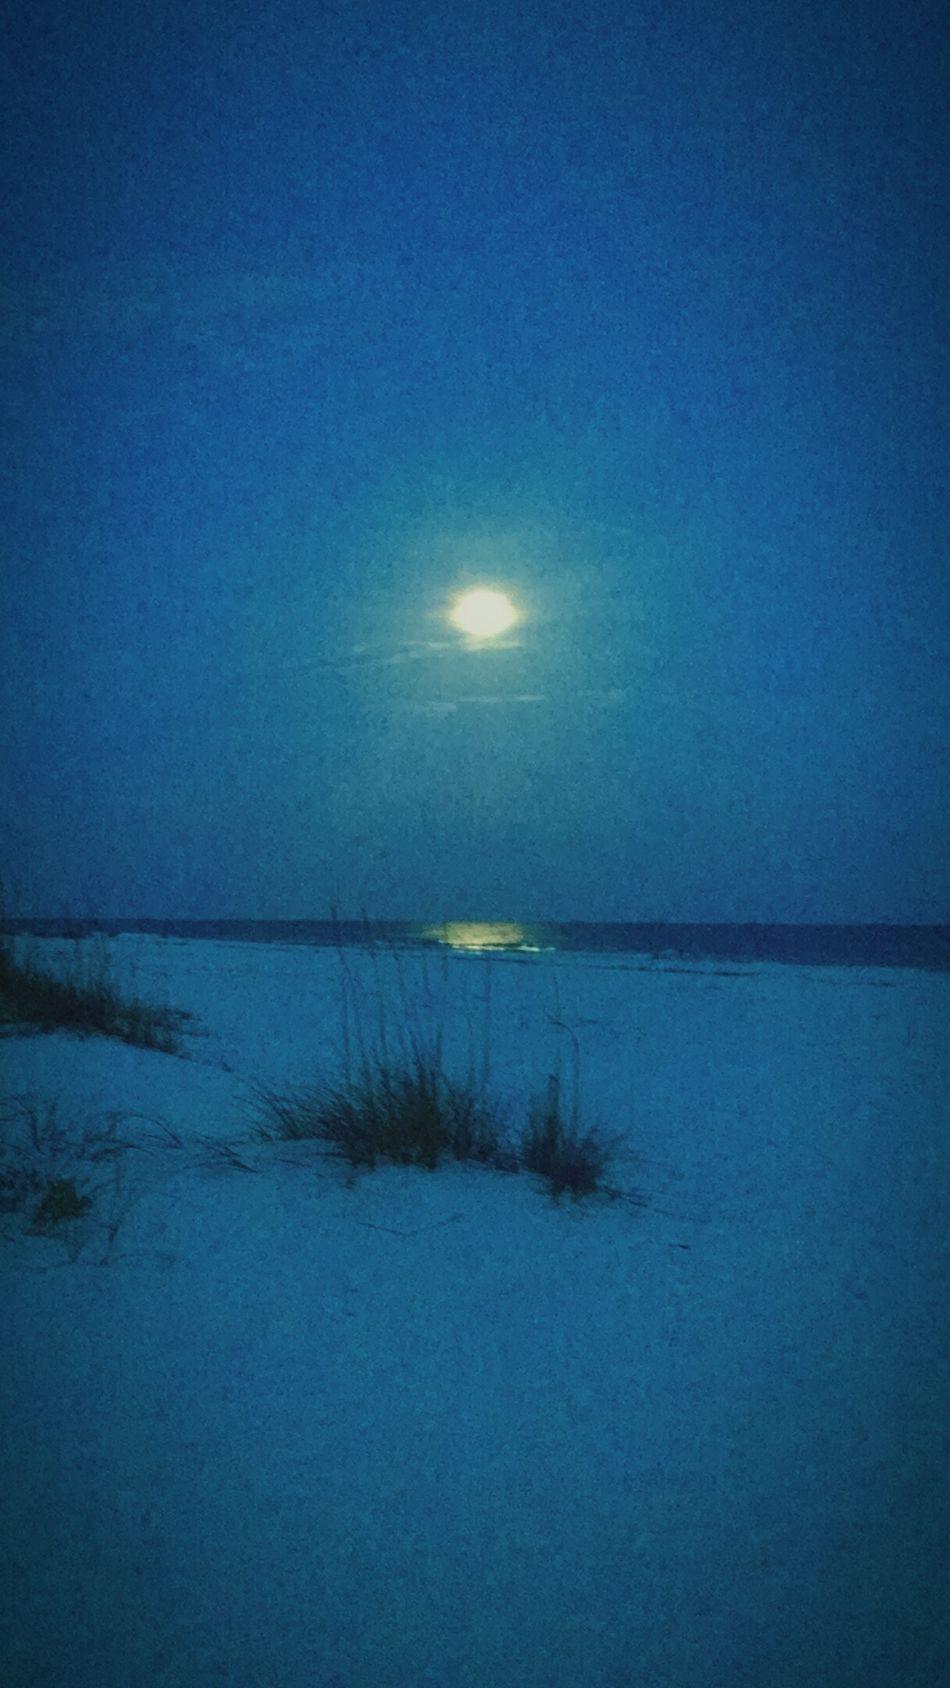 Calmness Blue Bluenight Sand Moonlight Full Moon Moon Beachatnight Exploring Nature Scenery Outdoors Beautiful Beautiful Nature Pensacola Beach Beach Water🐚🌌🌊🐬🐠